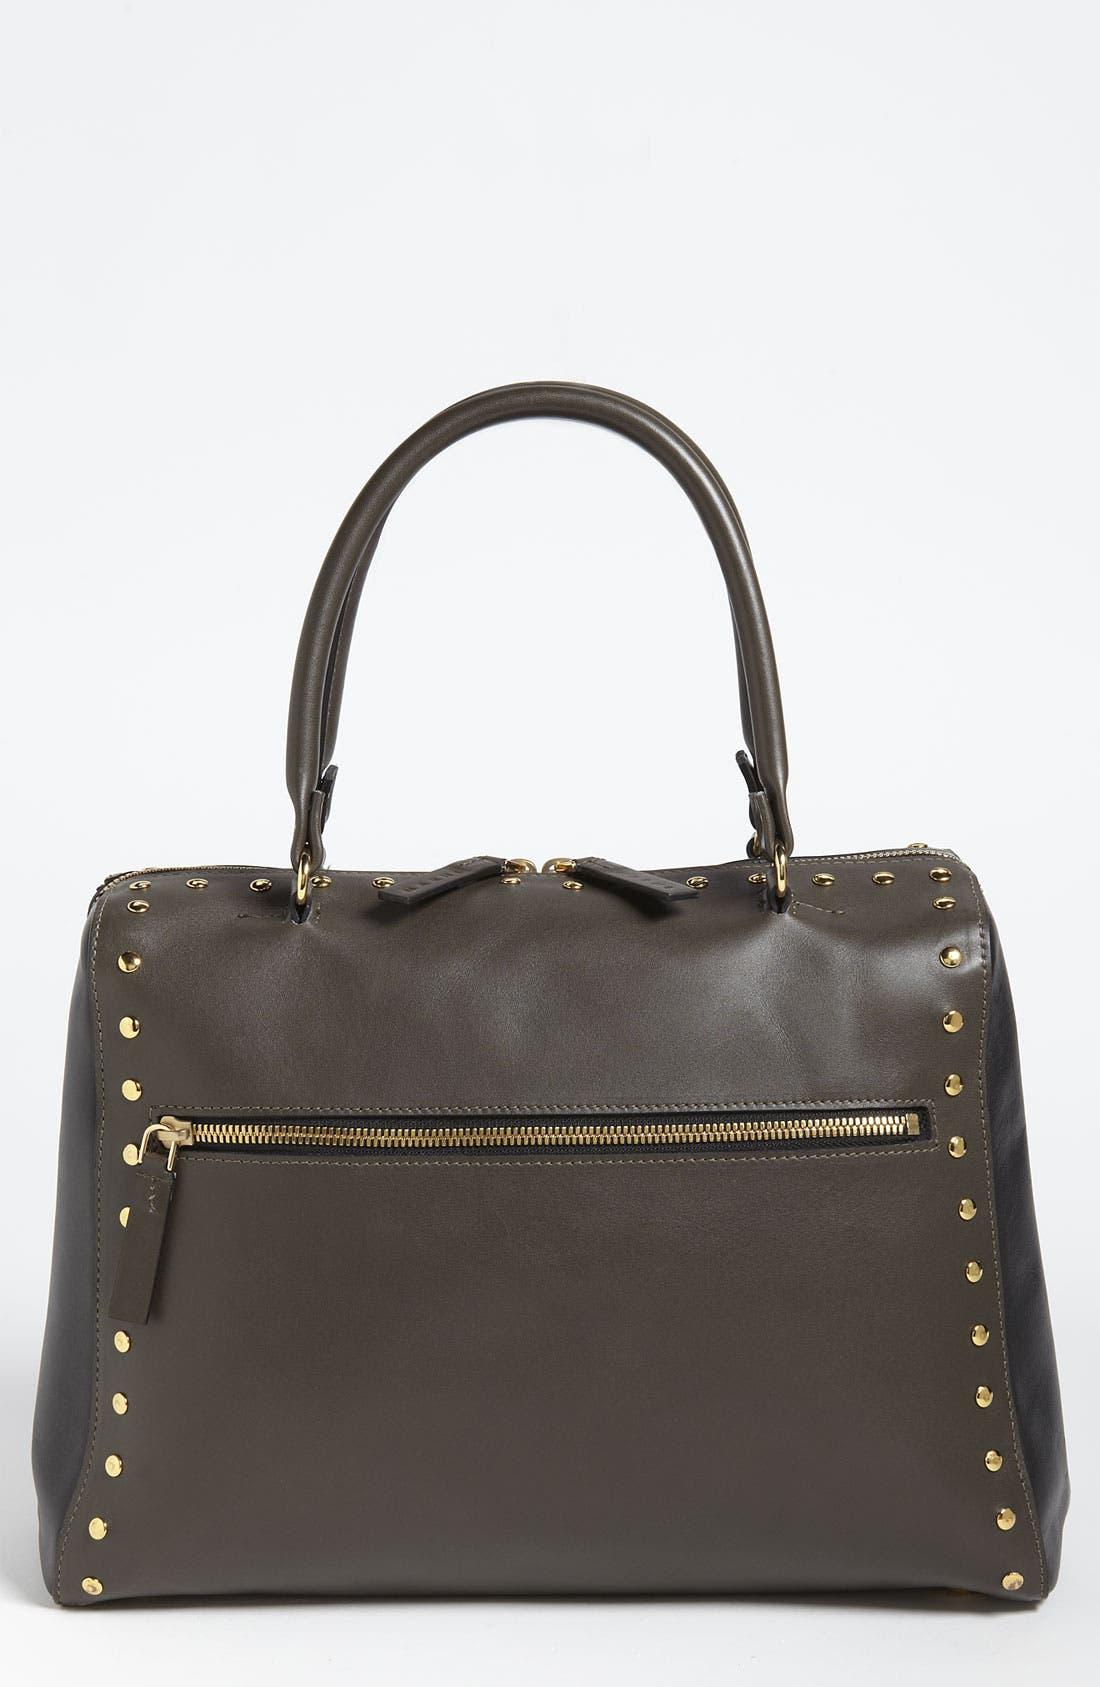 Alternate Image 1 Selected - Marni Studded Leather Satchel